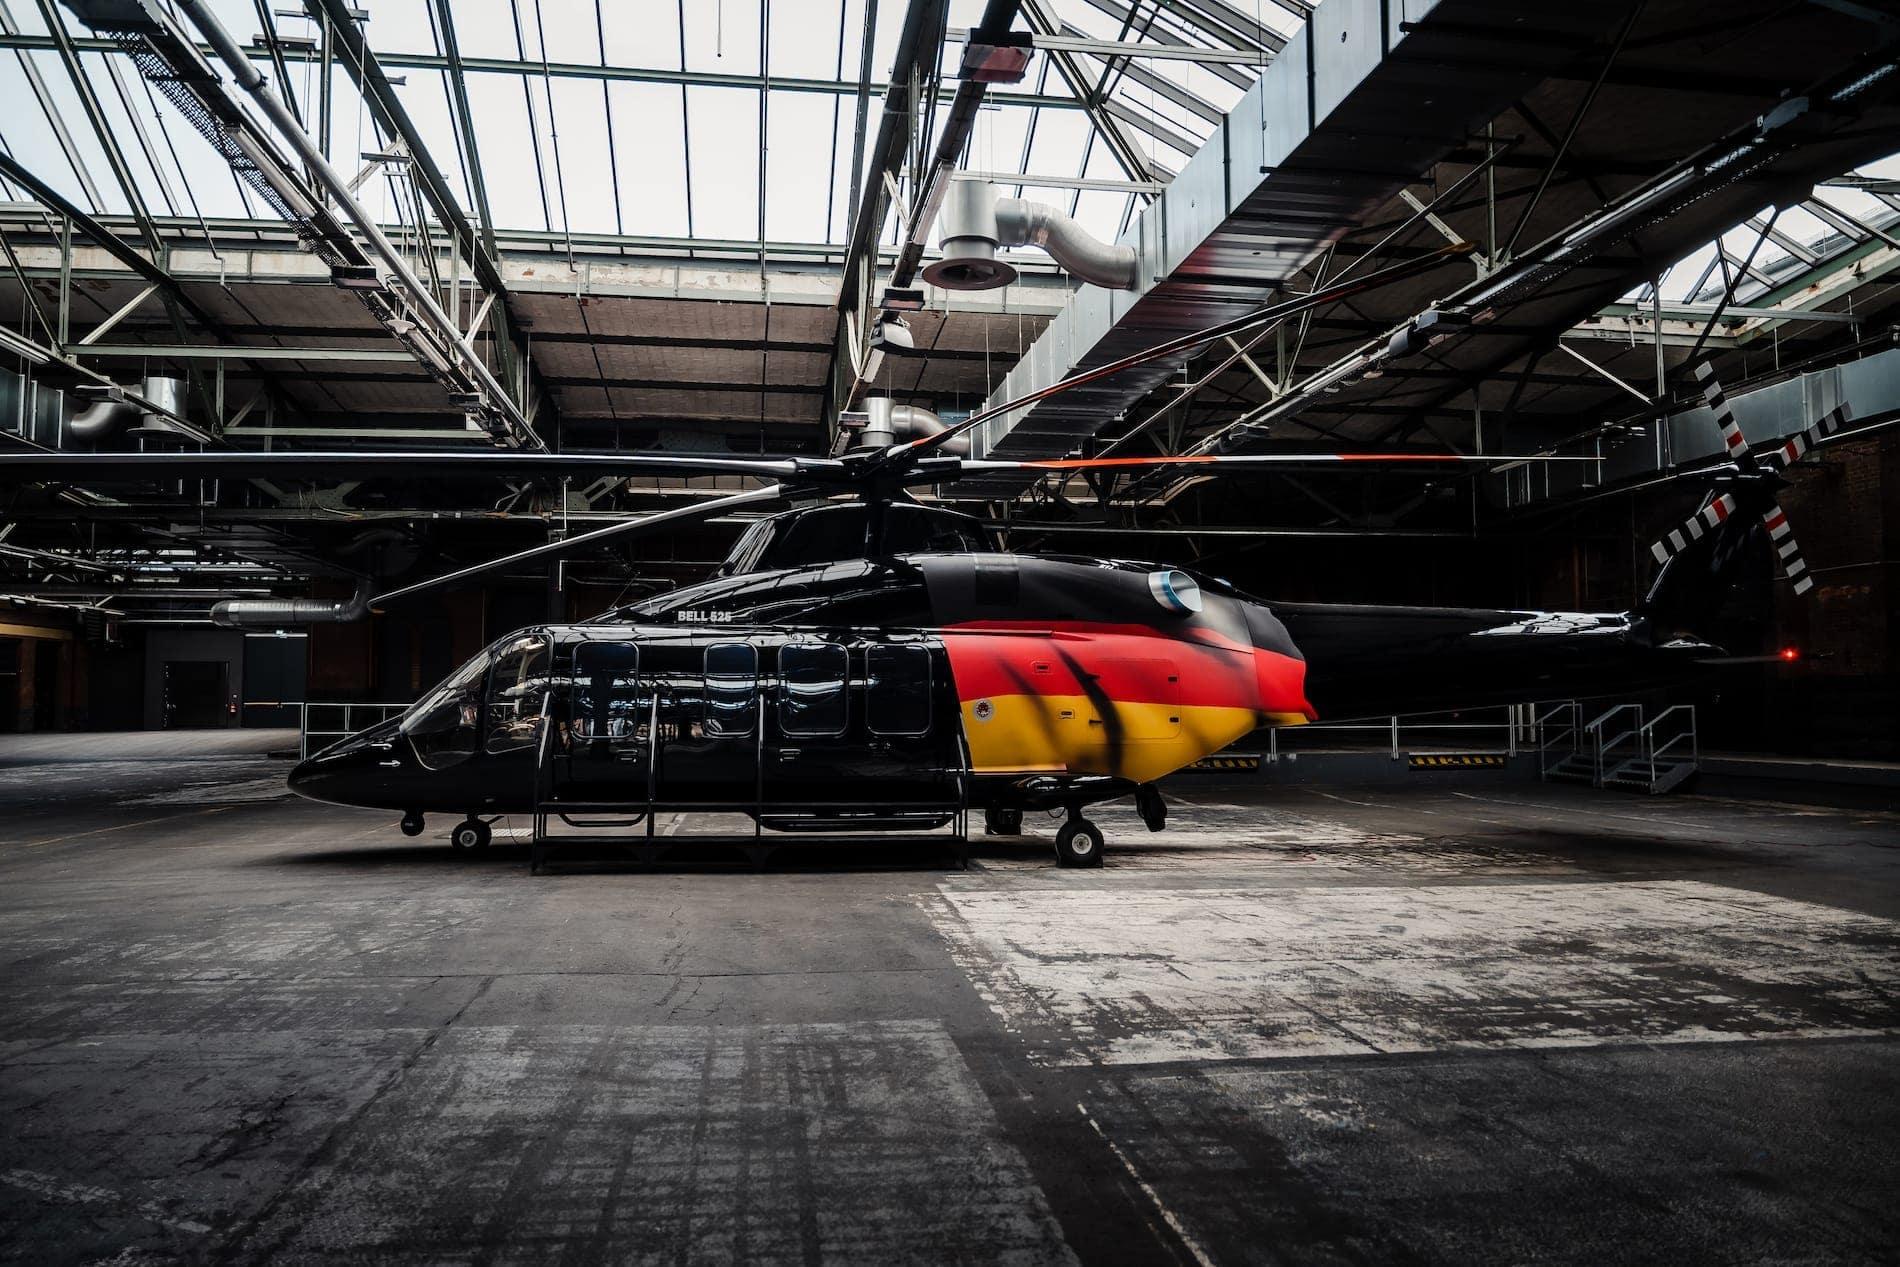 BELL_525_Germany-73